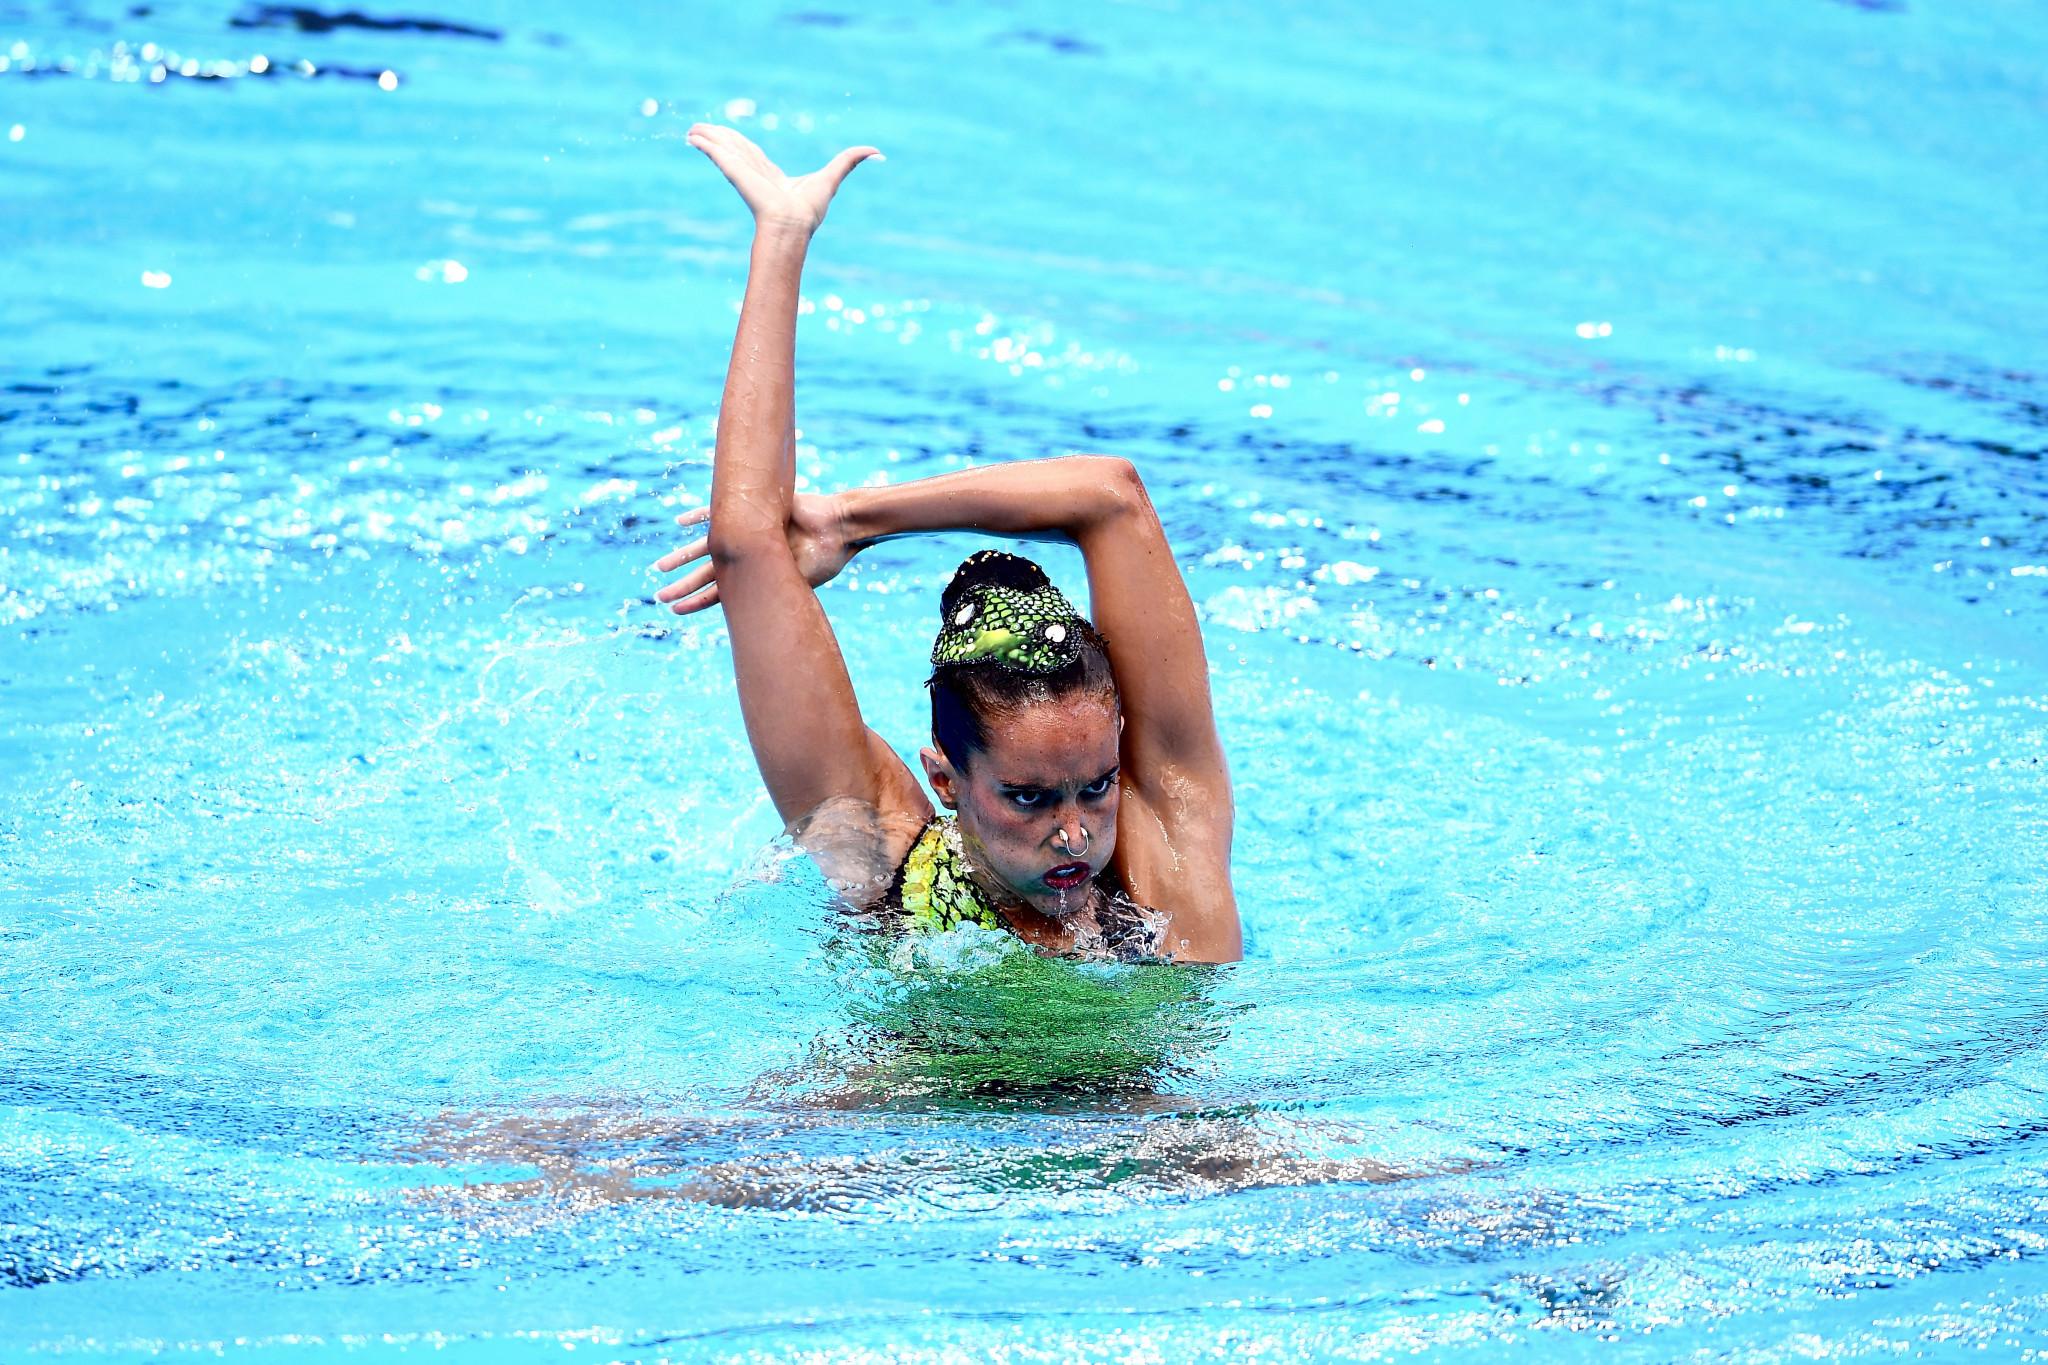 Paris to host curtain-raiser of FINA Artistic Swimming World Series campaign